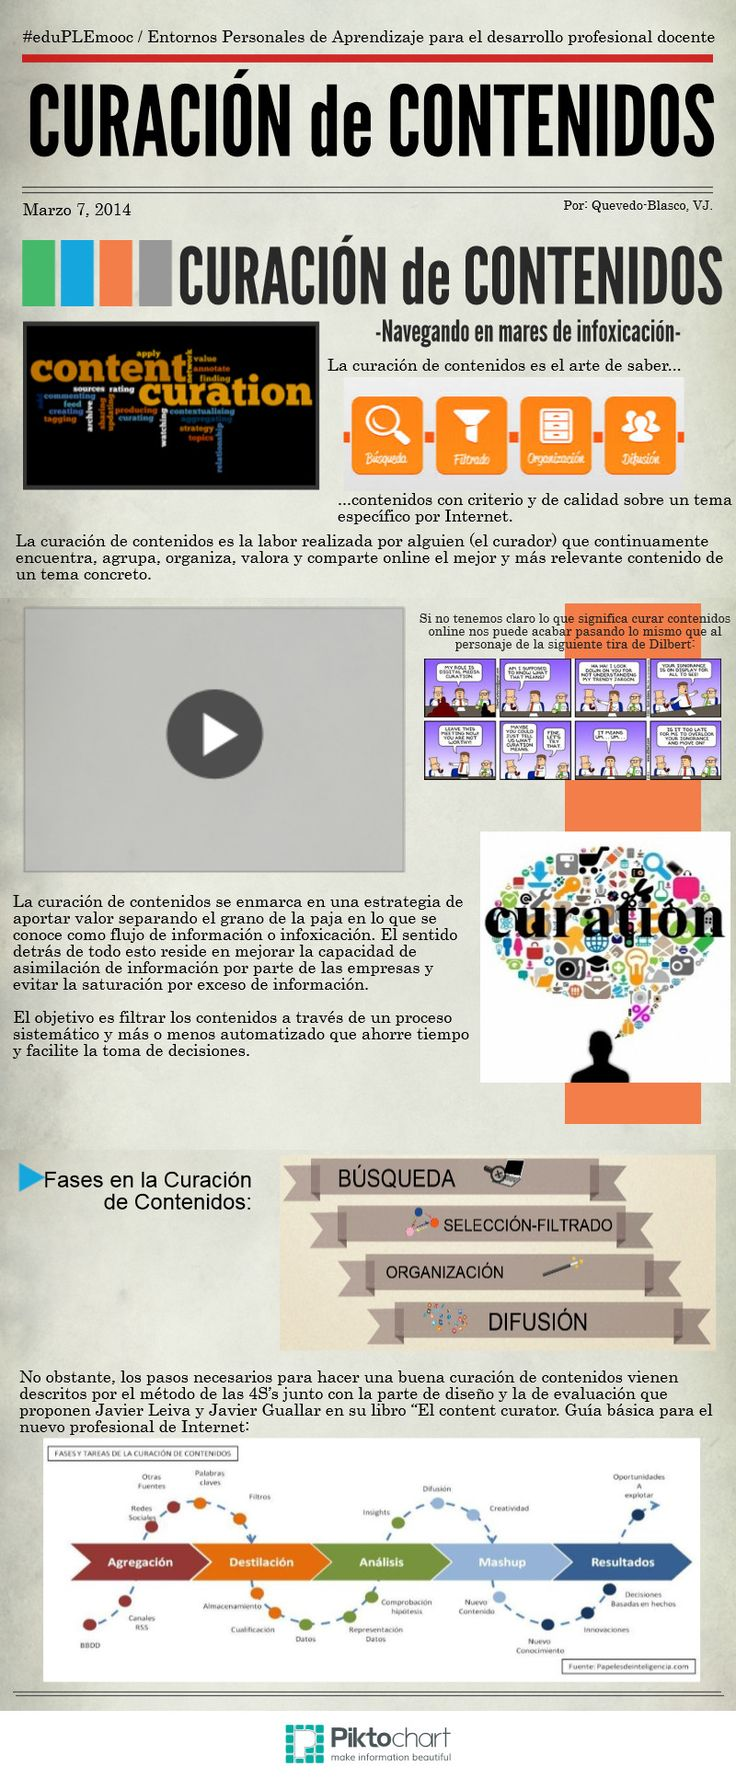 Curacion de Contenidos | @Piktochart Infographic